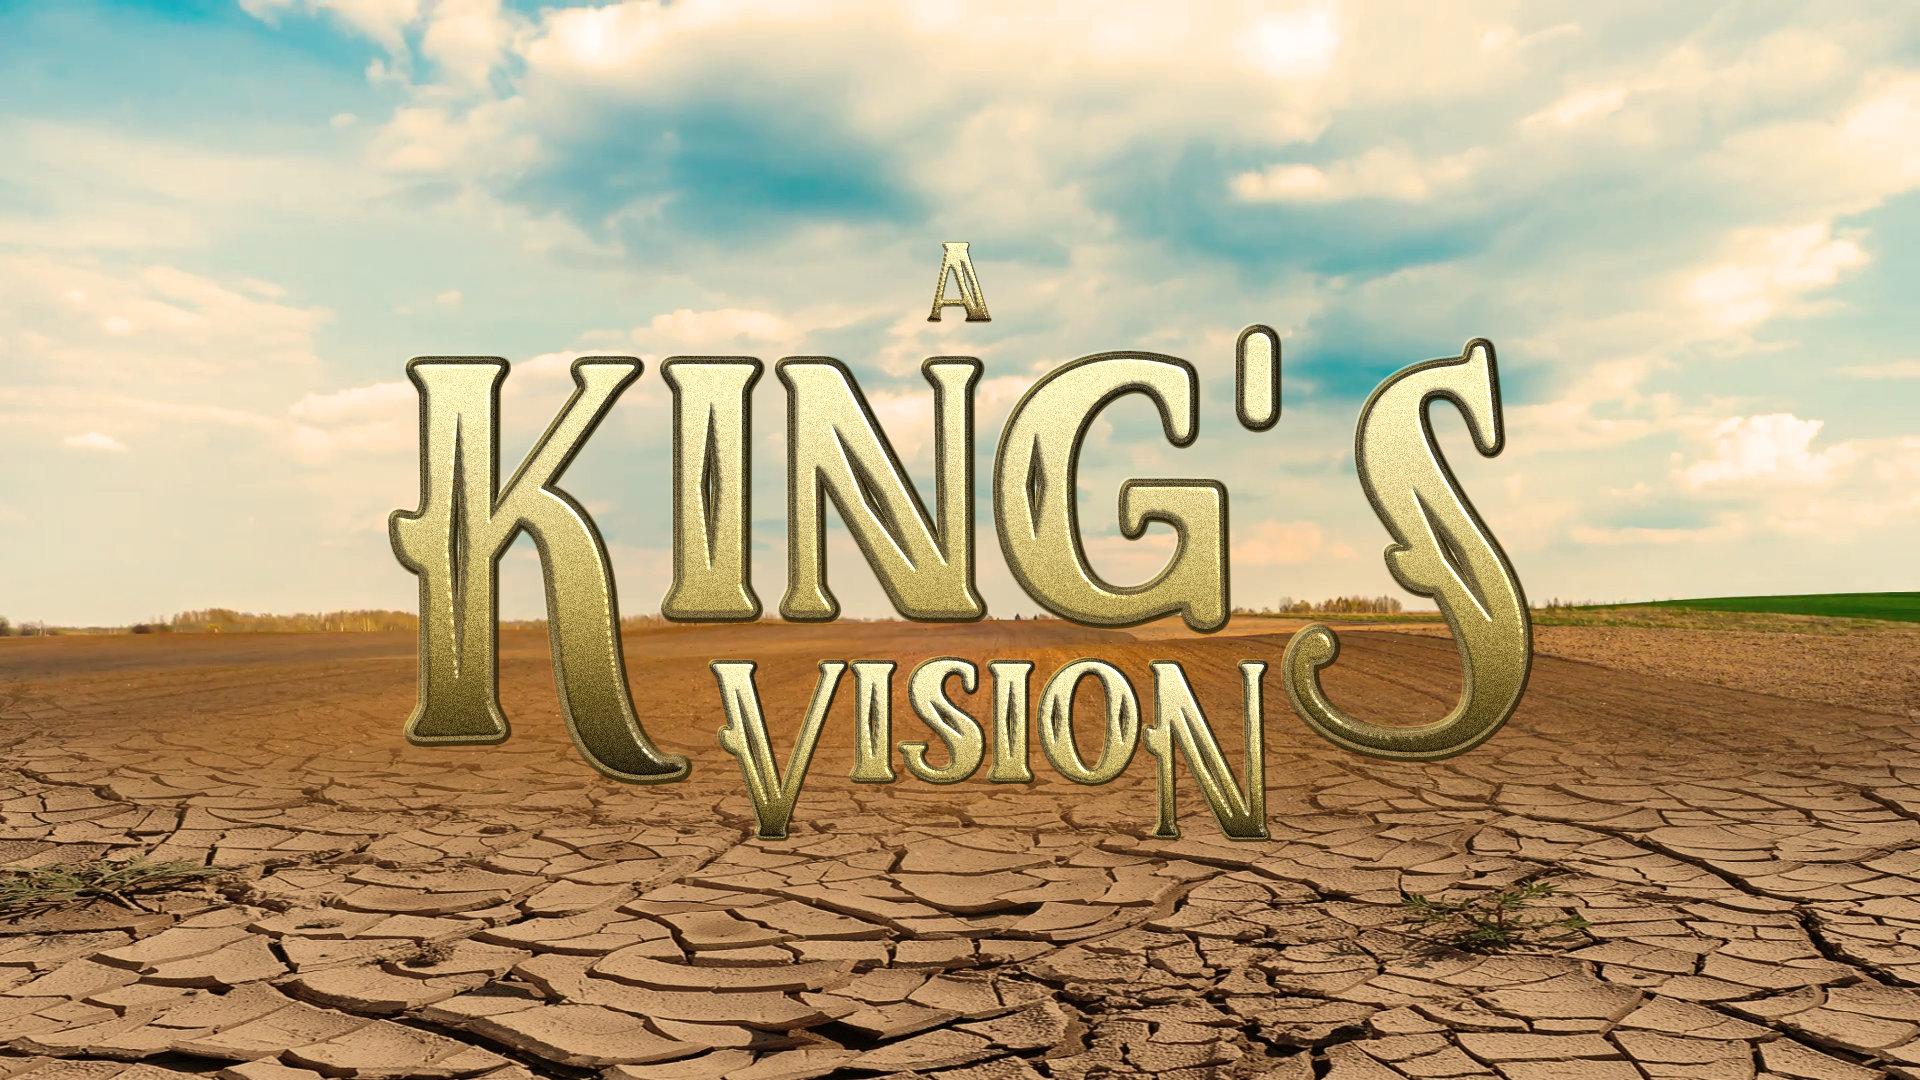 2019-06-23 A Kings Vision.jpg